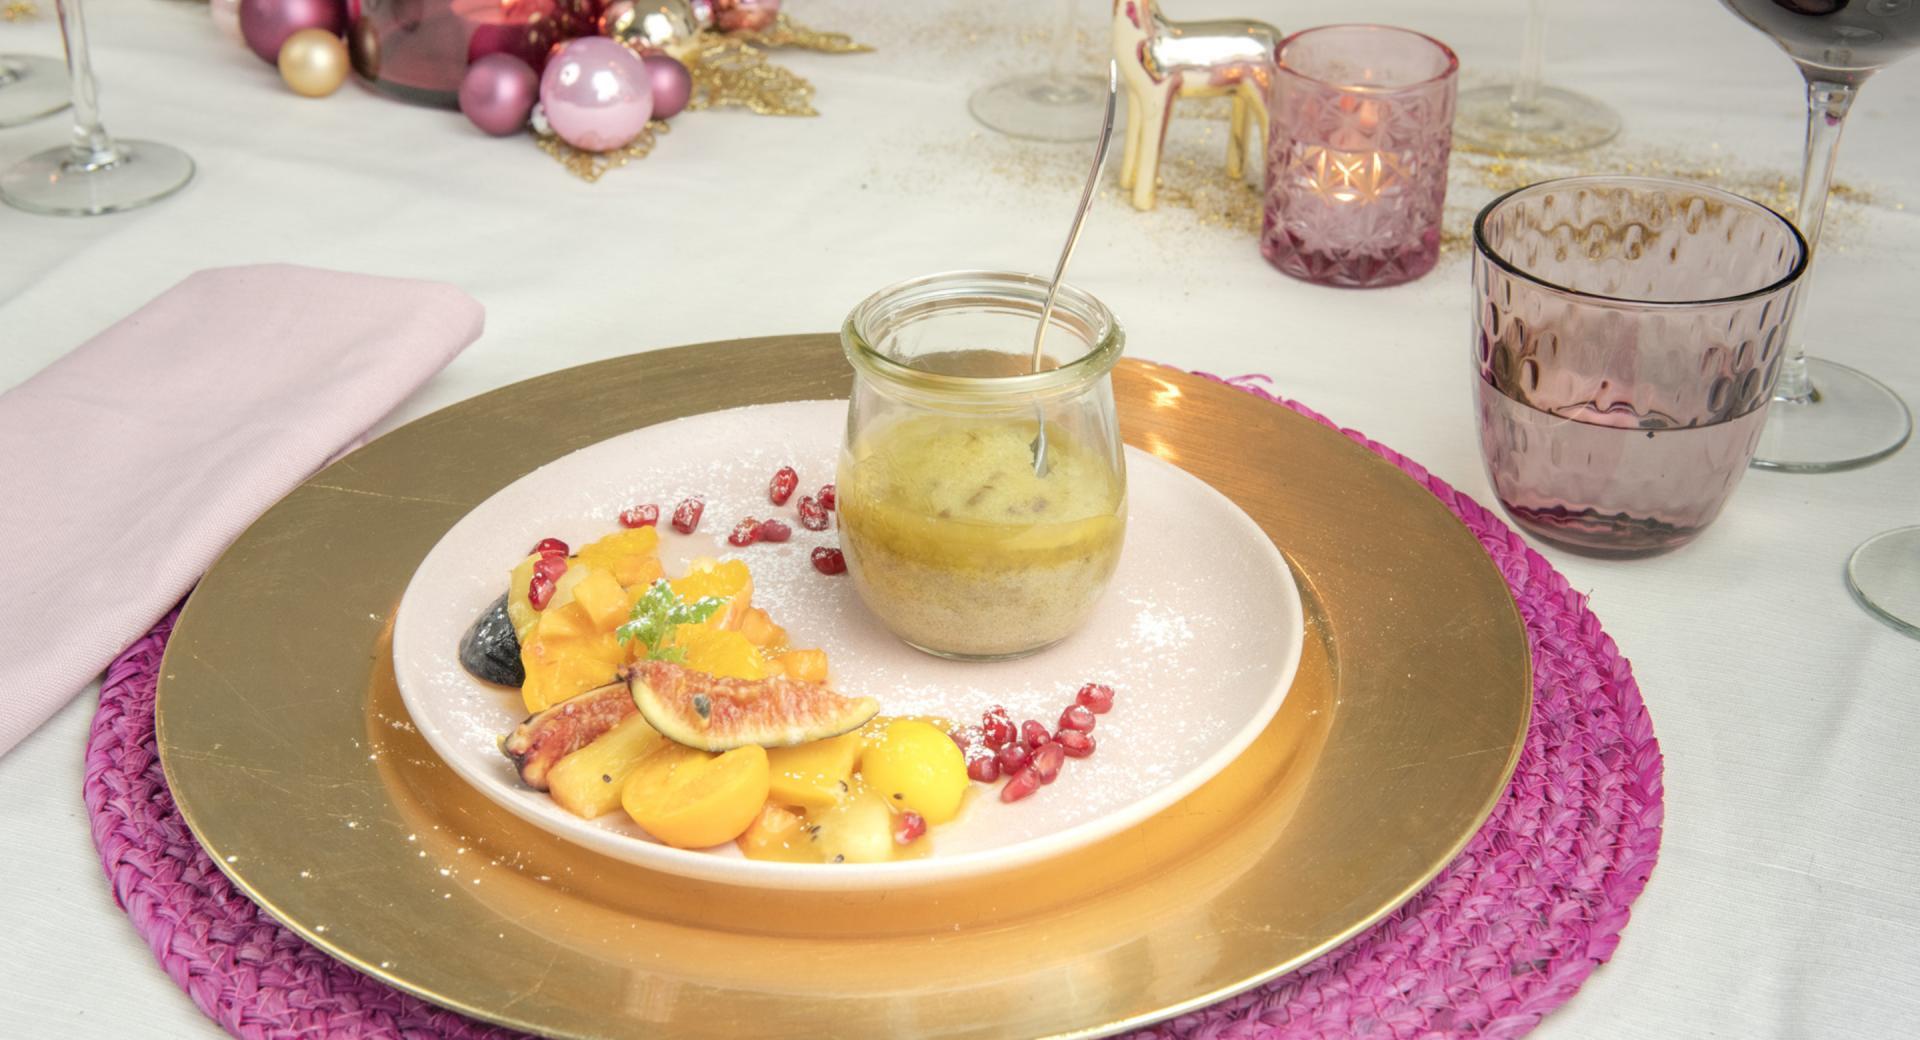 Dattel-Pudding mit Toffee-Sauce